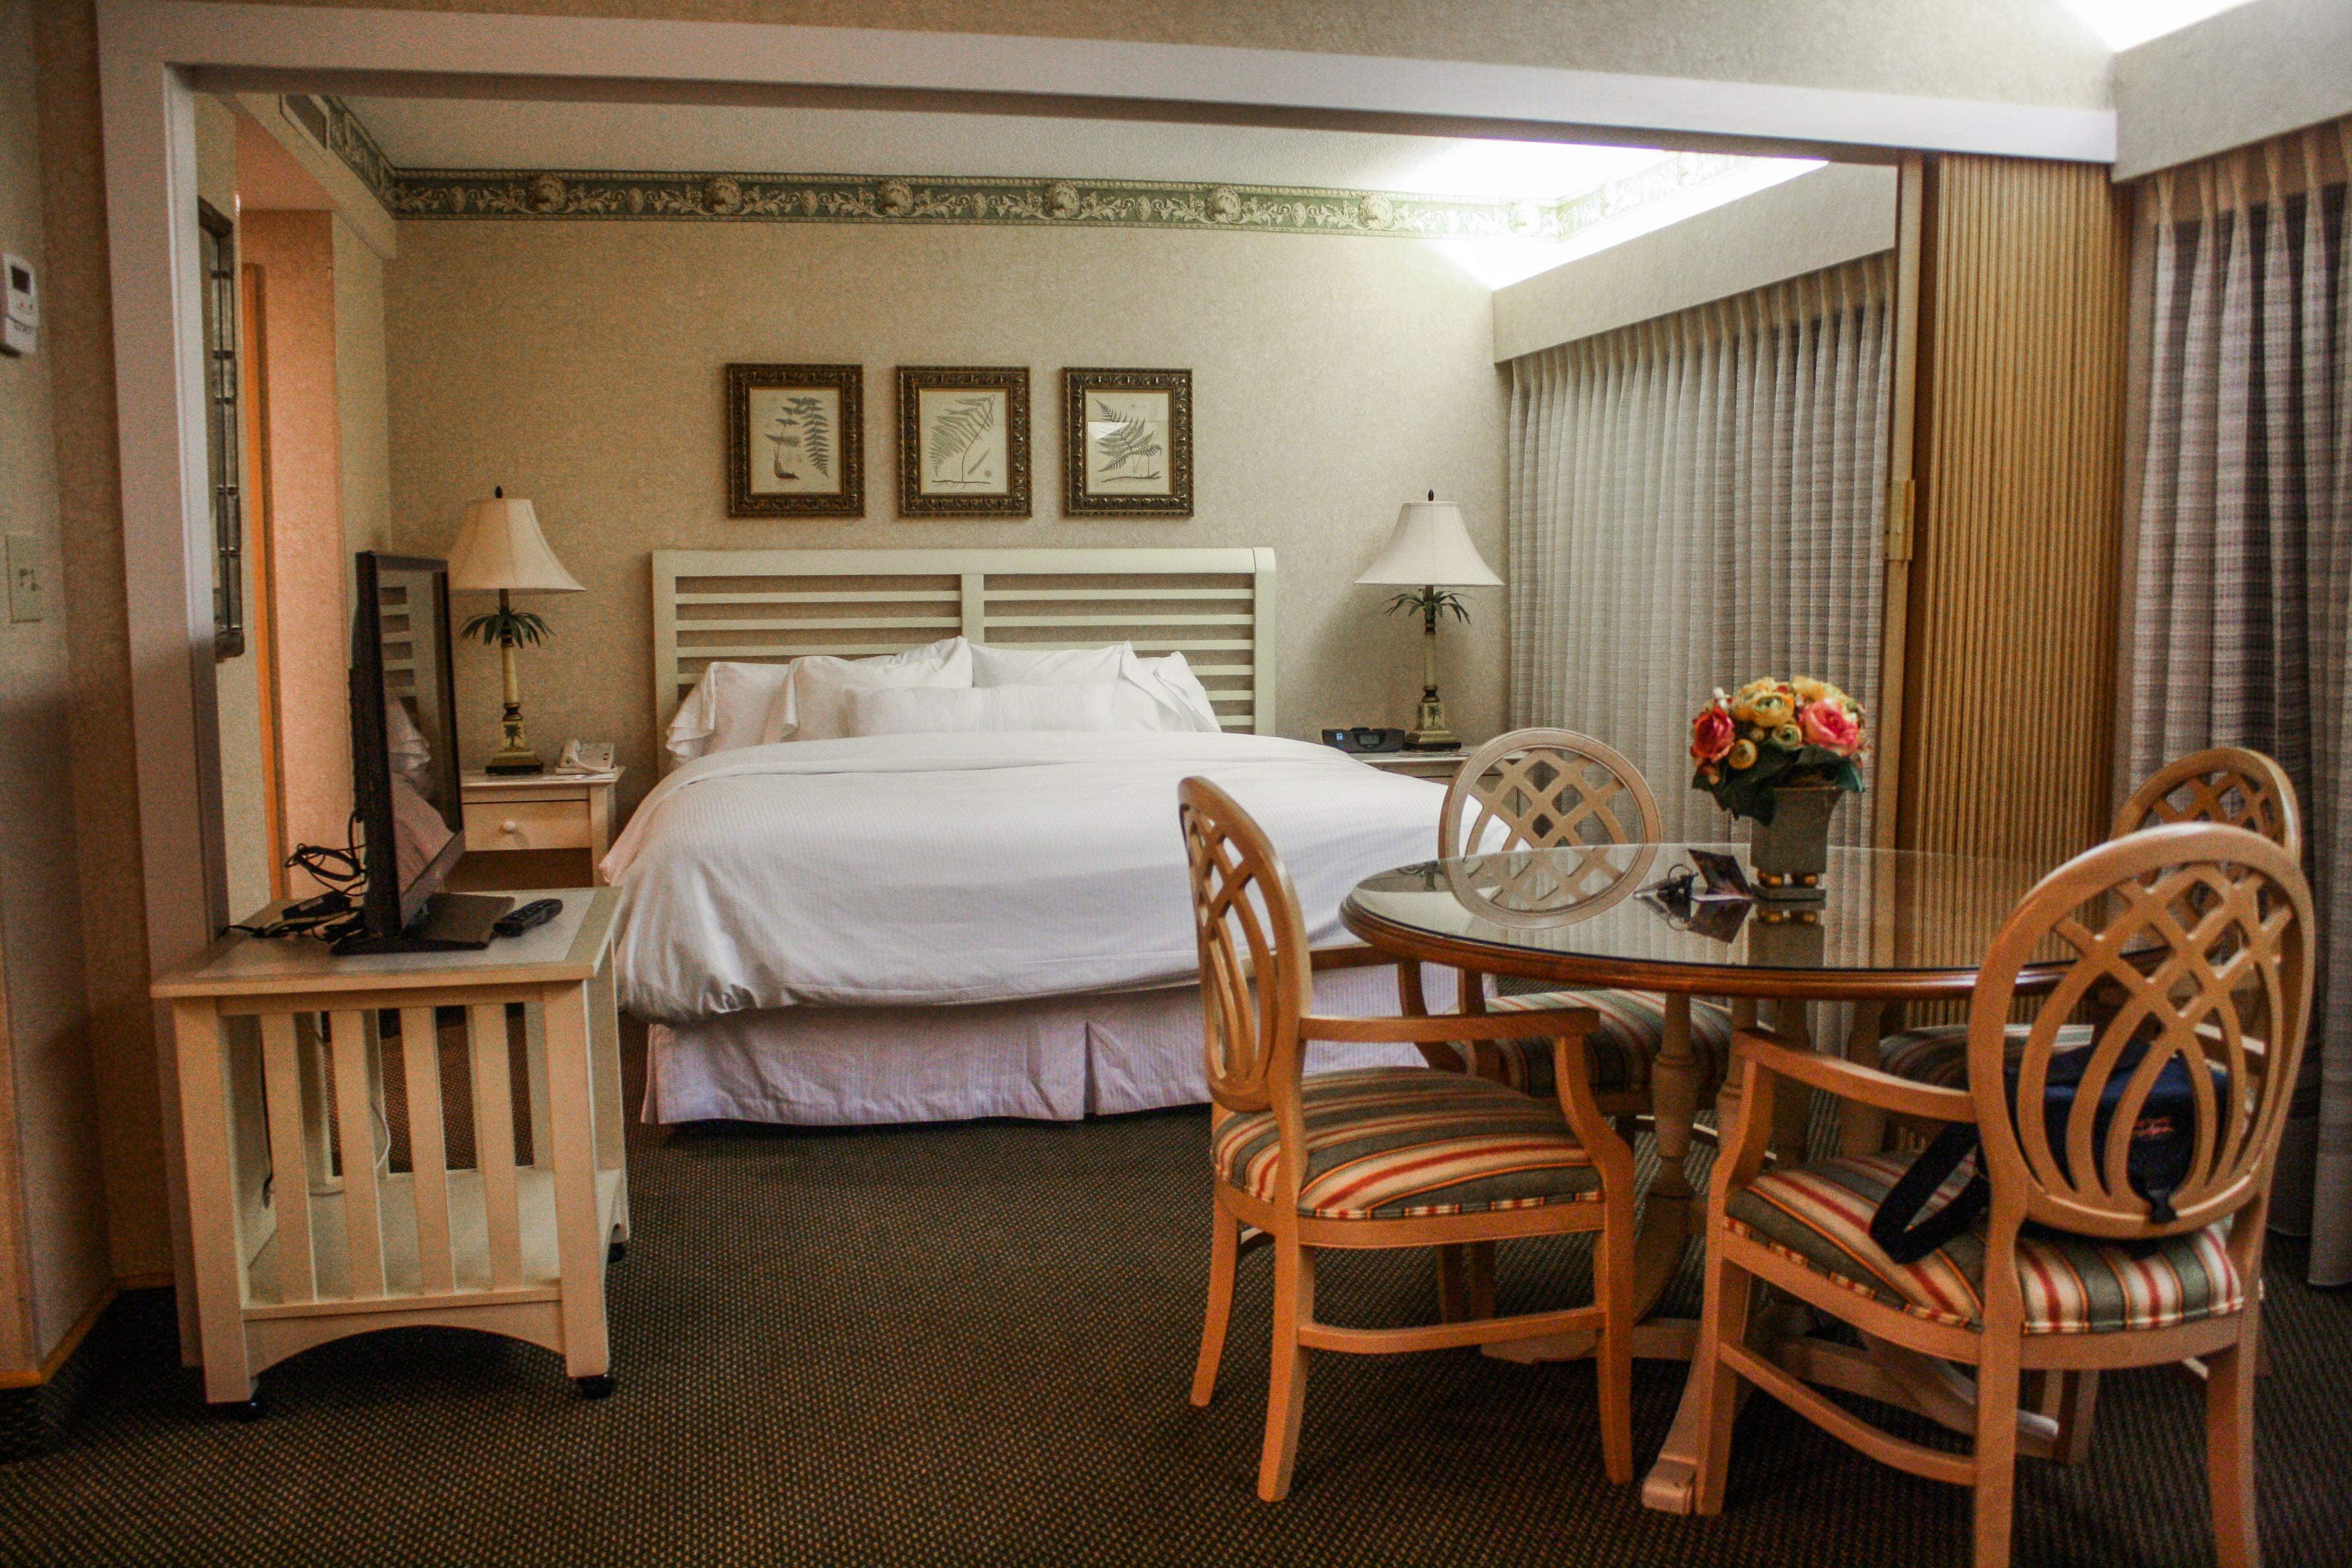 Bar Harbor Inn And Spa >> Innisbrook Golf & Spa Resort (Palm Harbor, Florida) | Stephen Travels